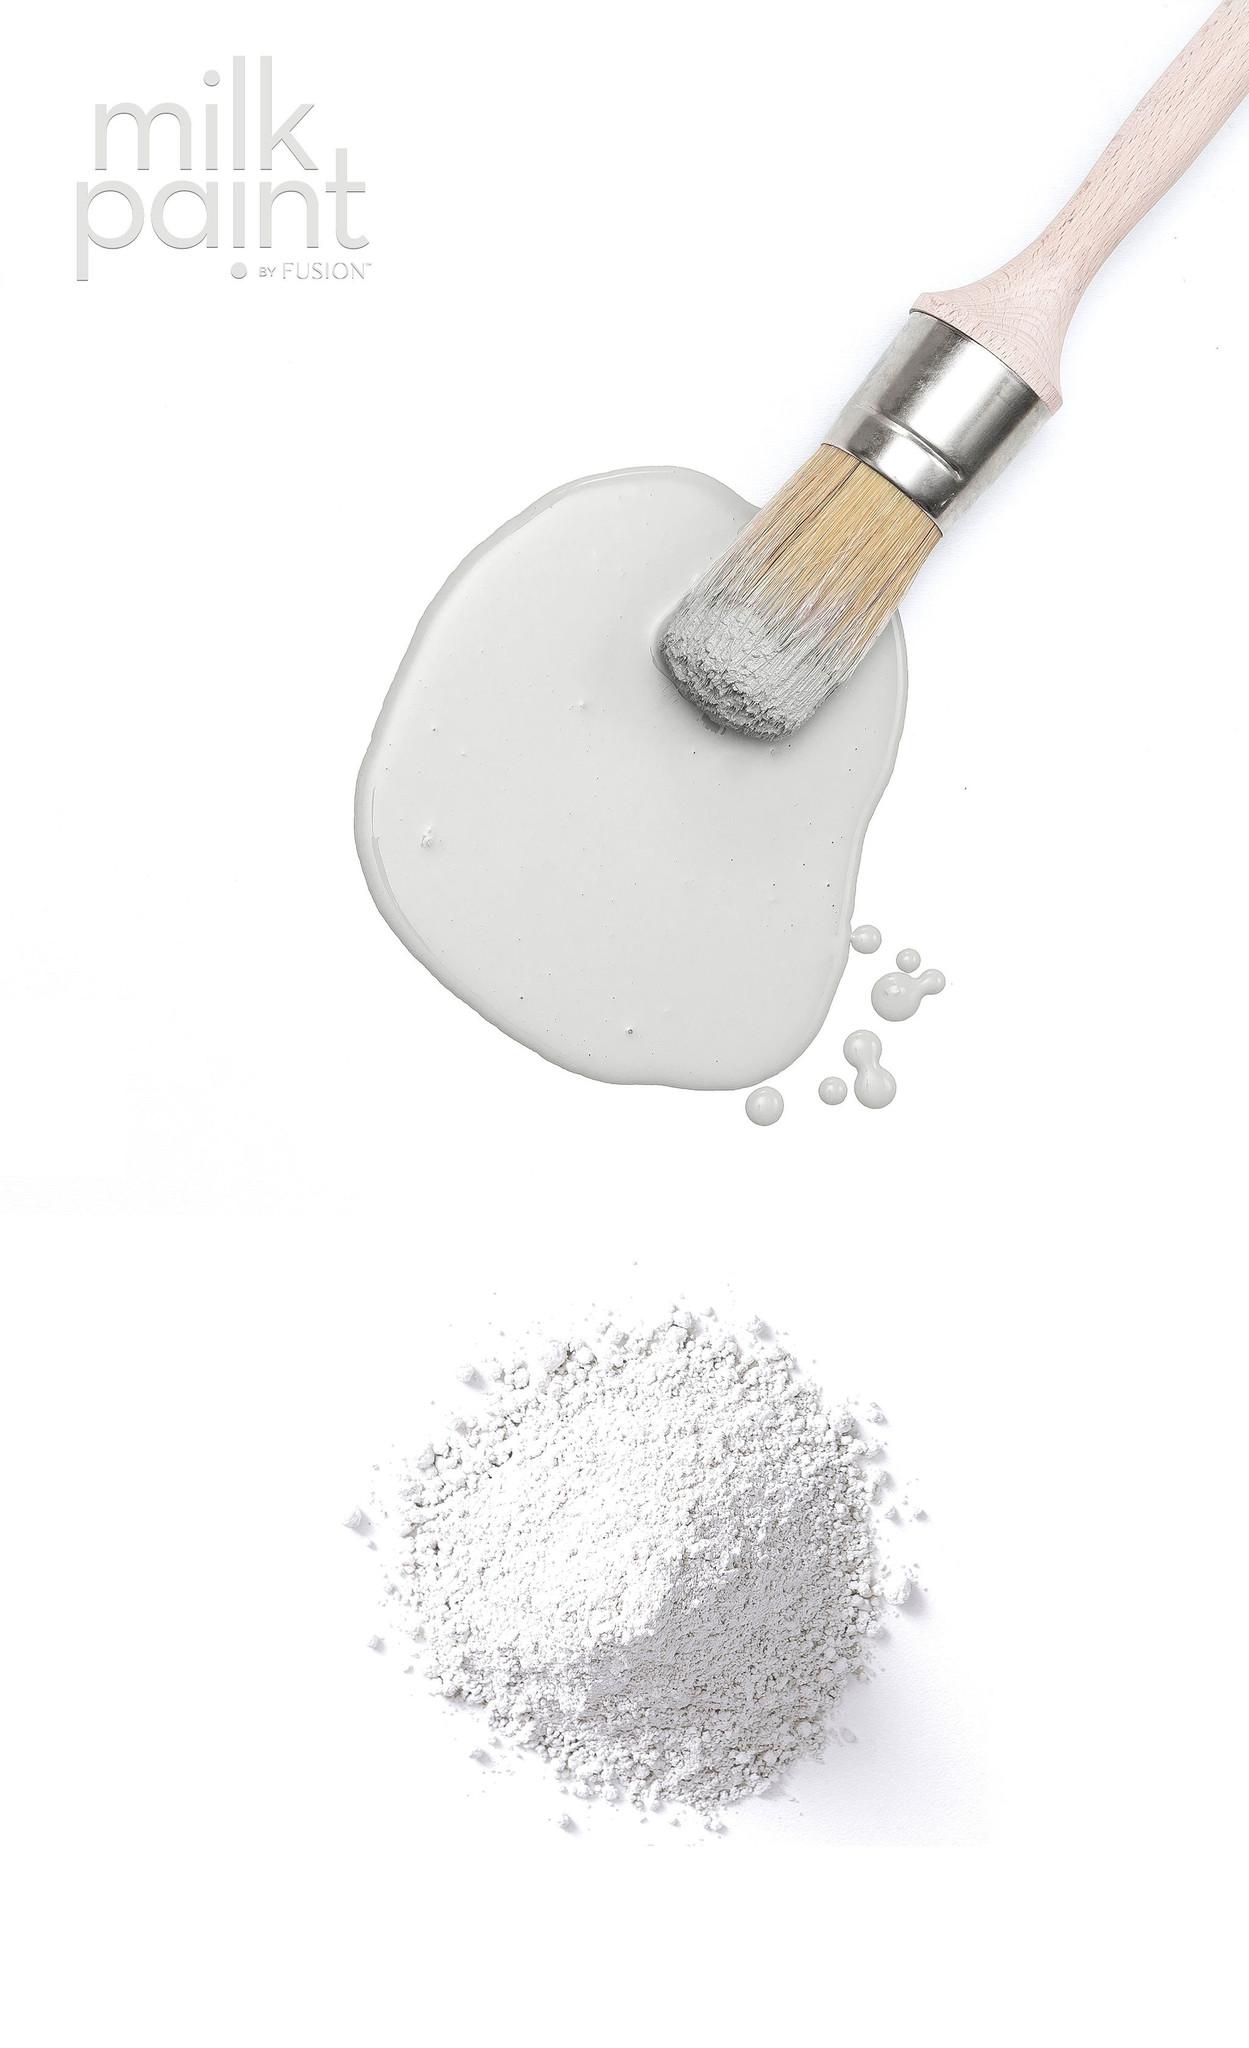 Fusion Mineral Paint Fusion - Milk Paint - Marble - 330gr